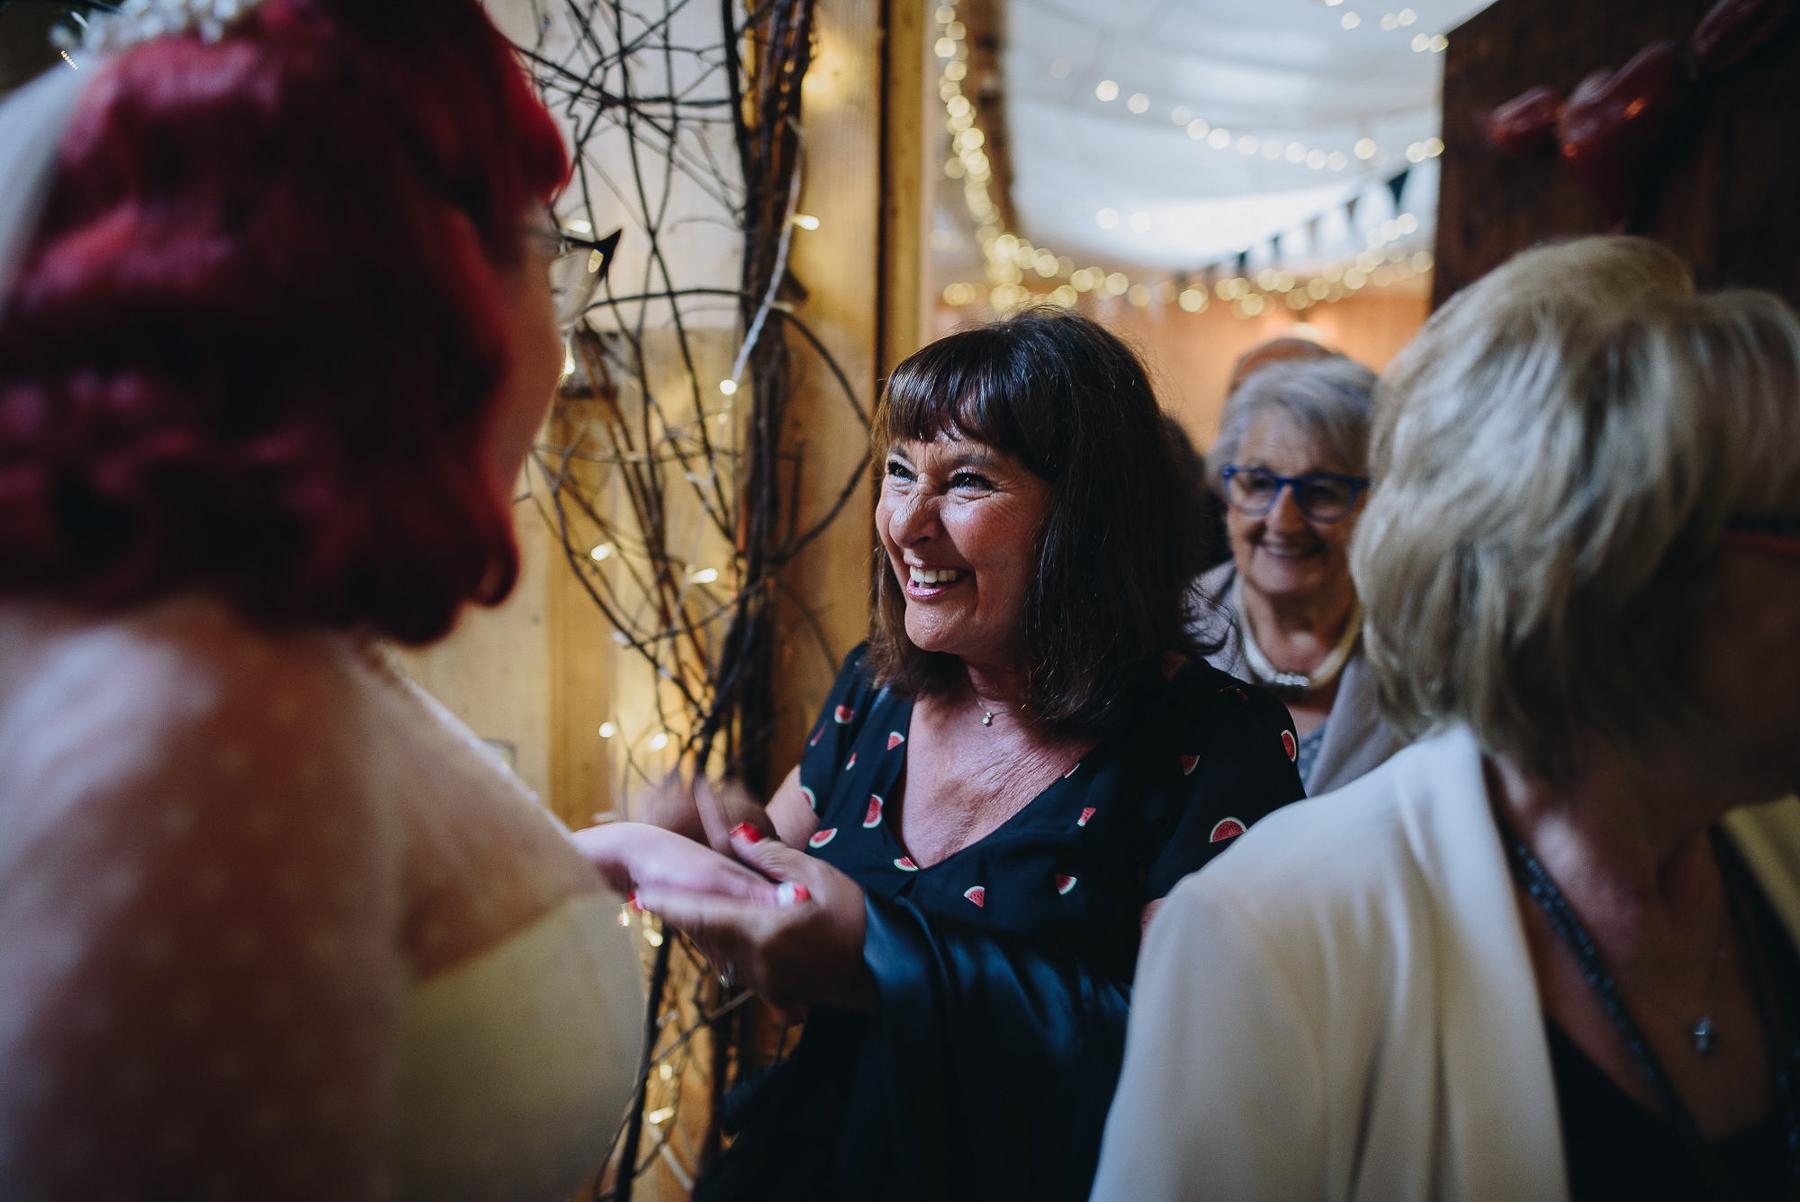 Wellbeing_Farm_Wedding_Photography_The_Pin-Up_Bride_Lara_Shaun-73.jpg